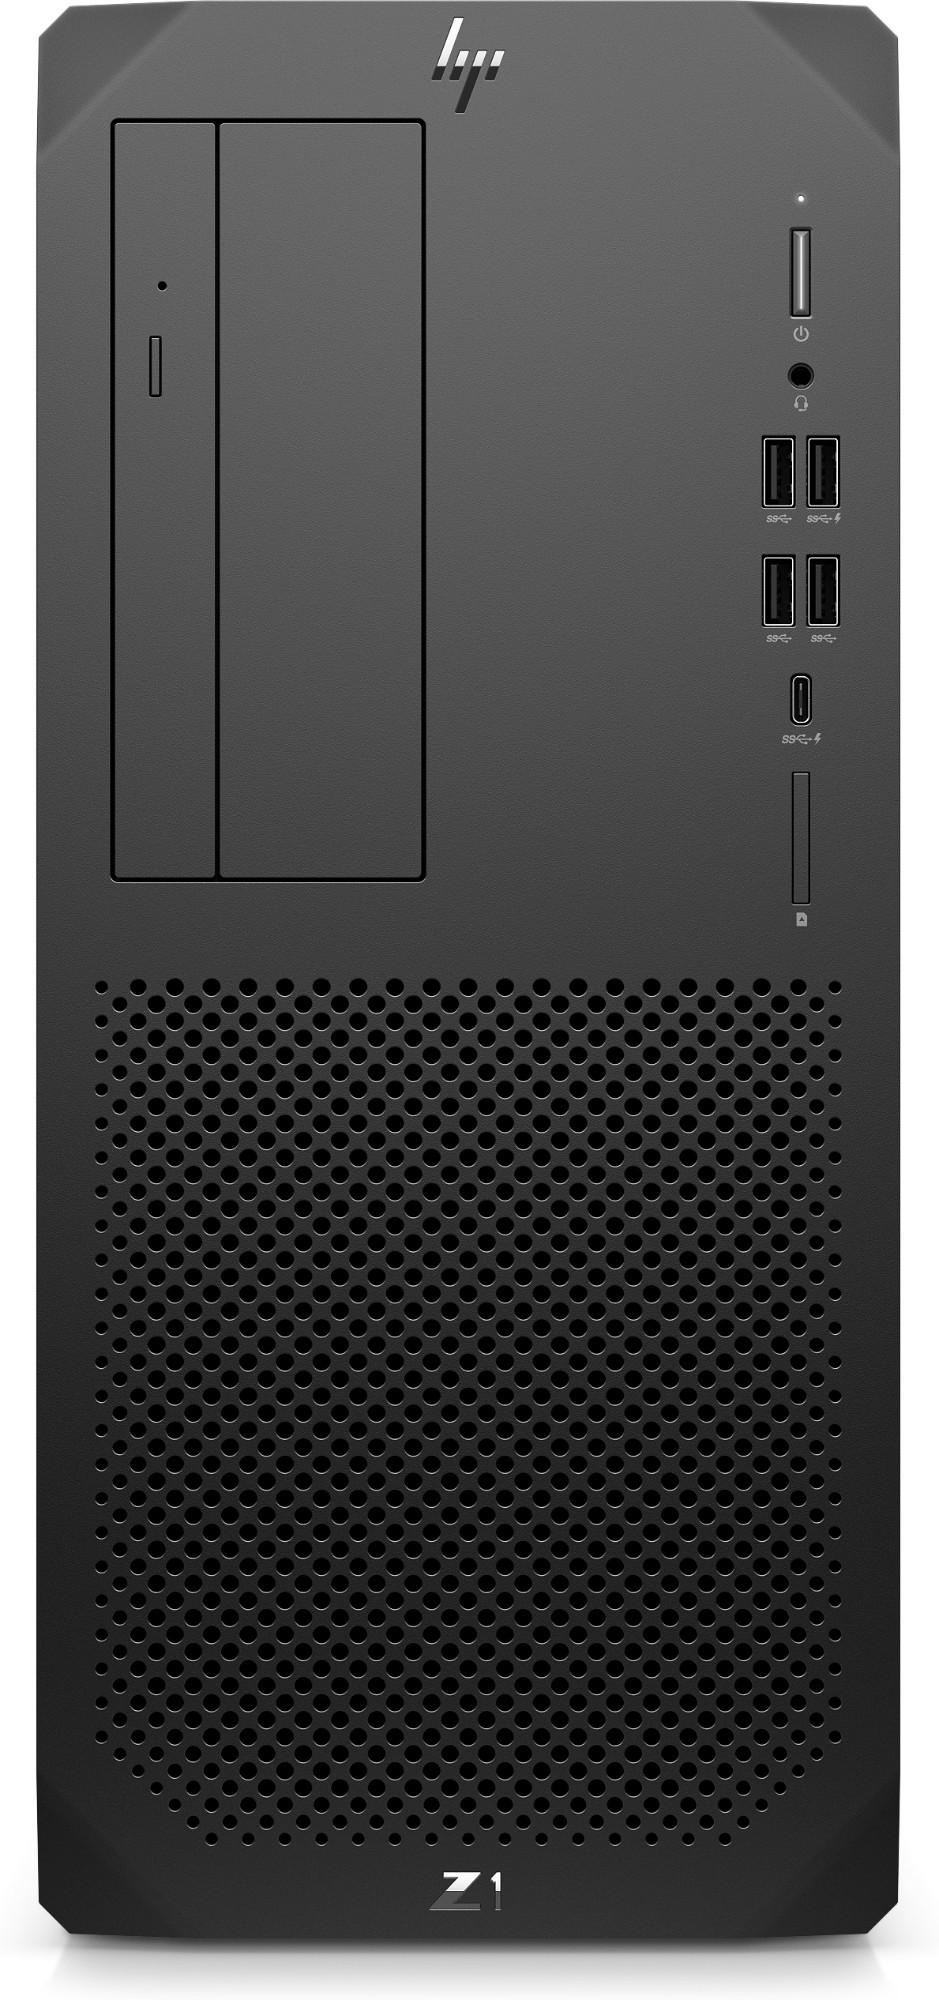 HP Z1 G6 DDR4-SDRAM i7-10700 Tower 10th gen Intel-� Core��� i7 16 GB 512 GB SSD Windows 10 Pro for Workstations Workstation Black